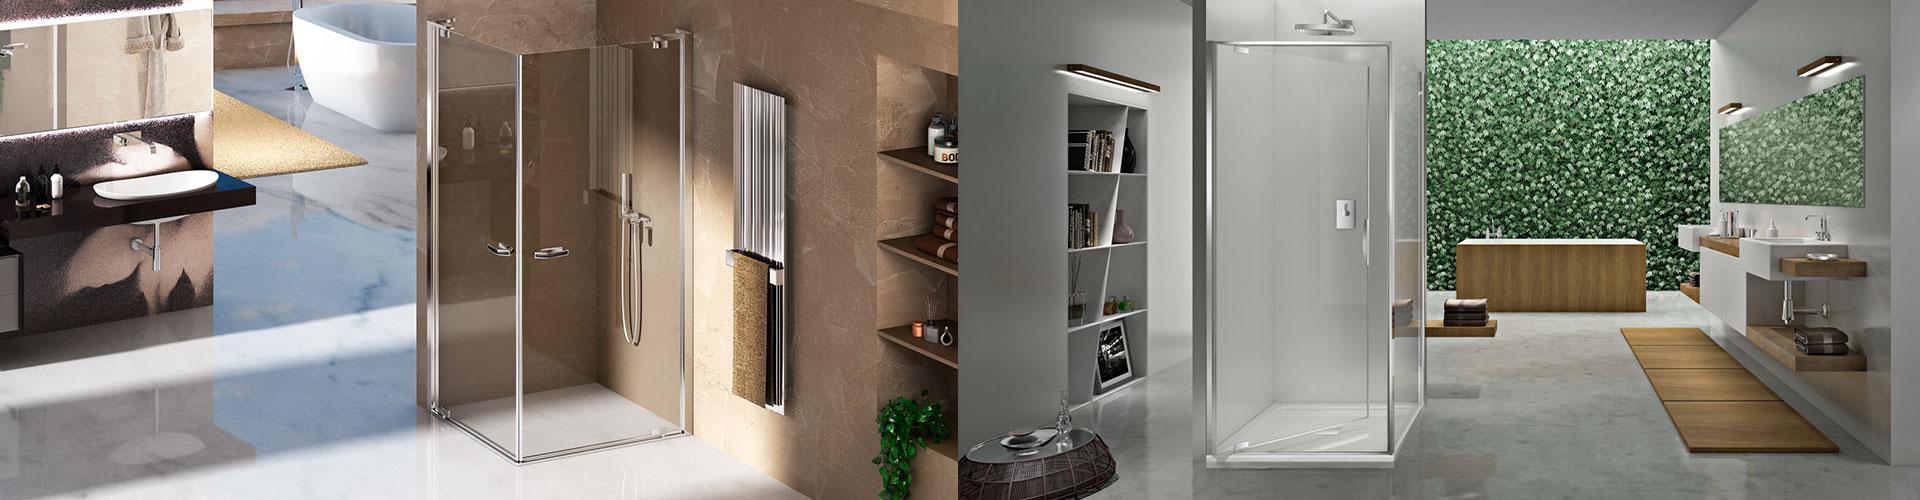 Sistemi doccia duka carboni casa for Duka cabine doccia